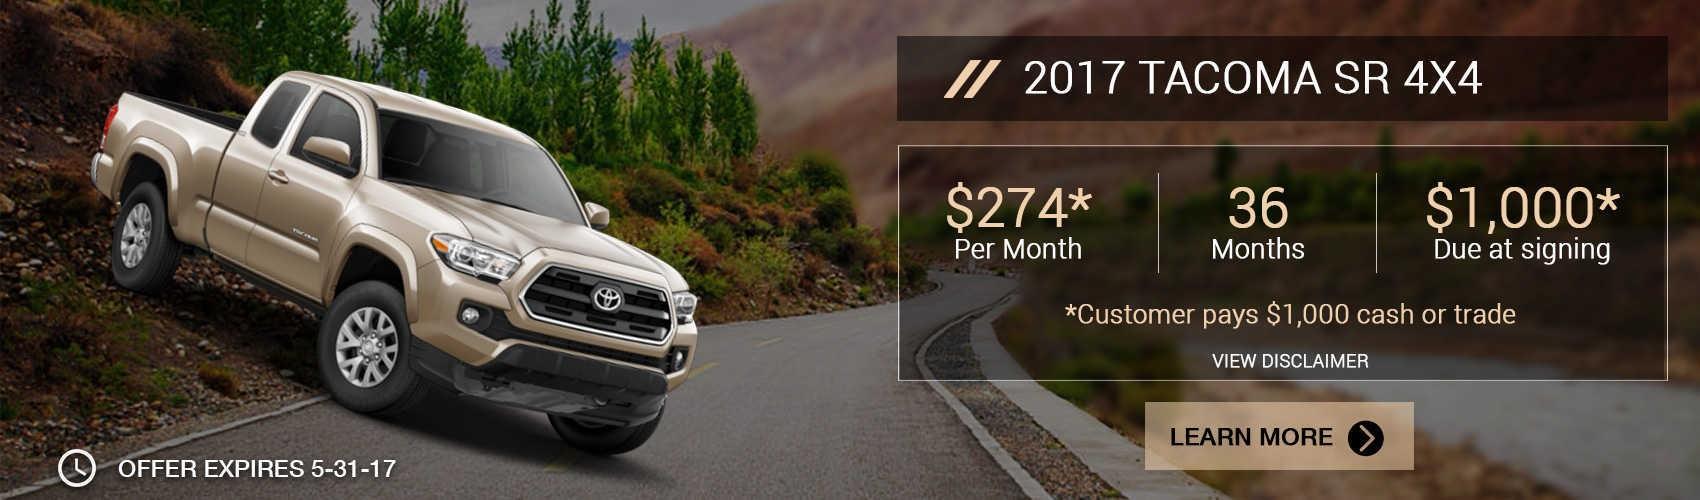 2017 Tacoma SR 4X4 for $274 per month at Beaverton Toyota